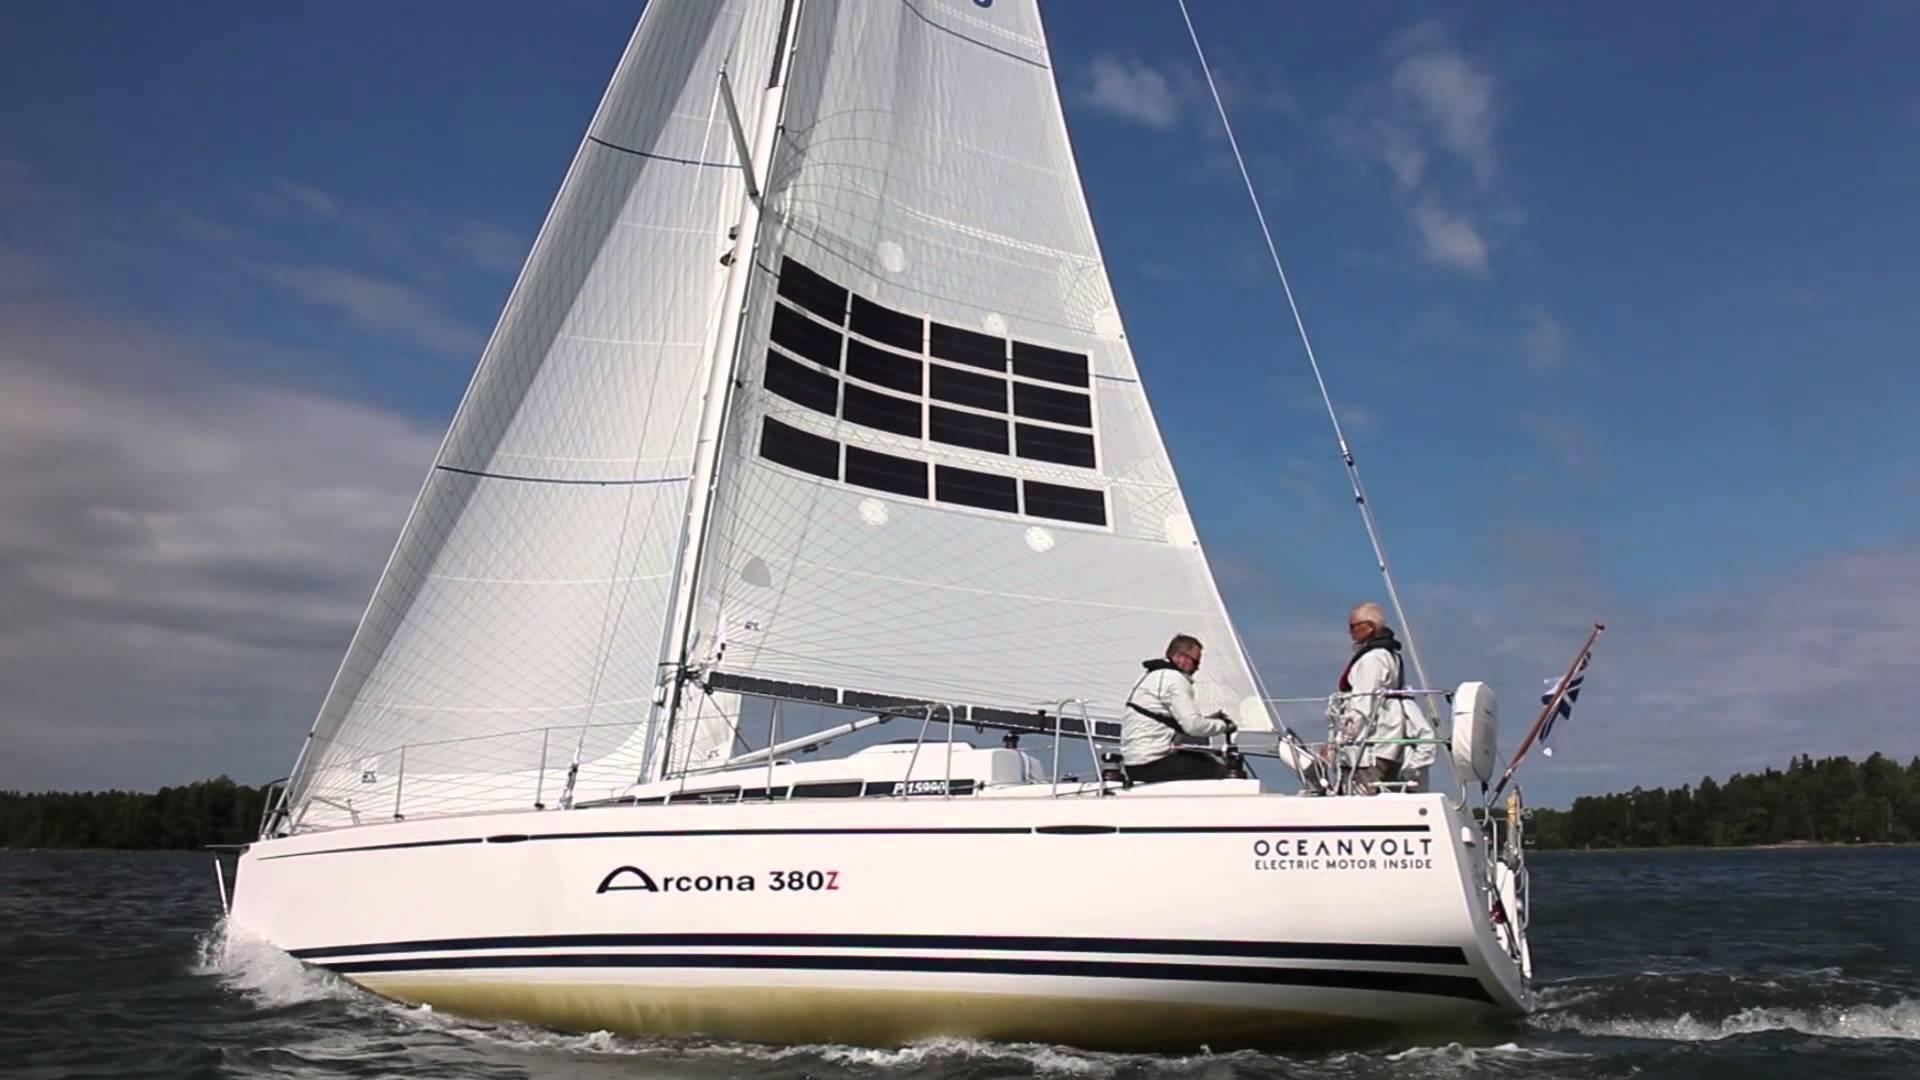 Installing Solar Panels On A Boat